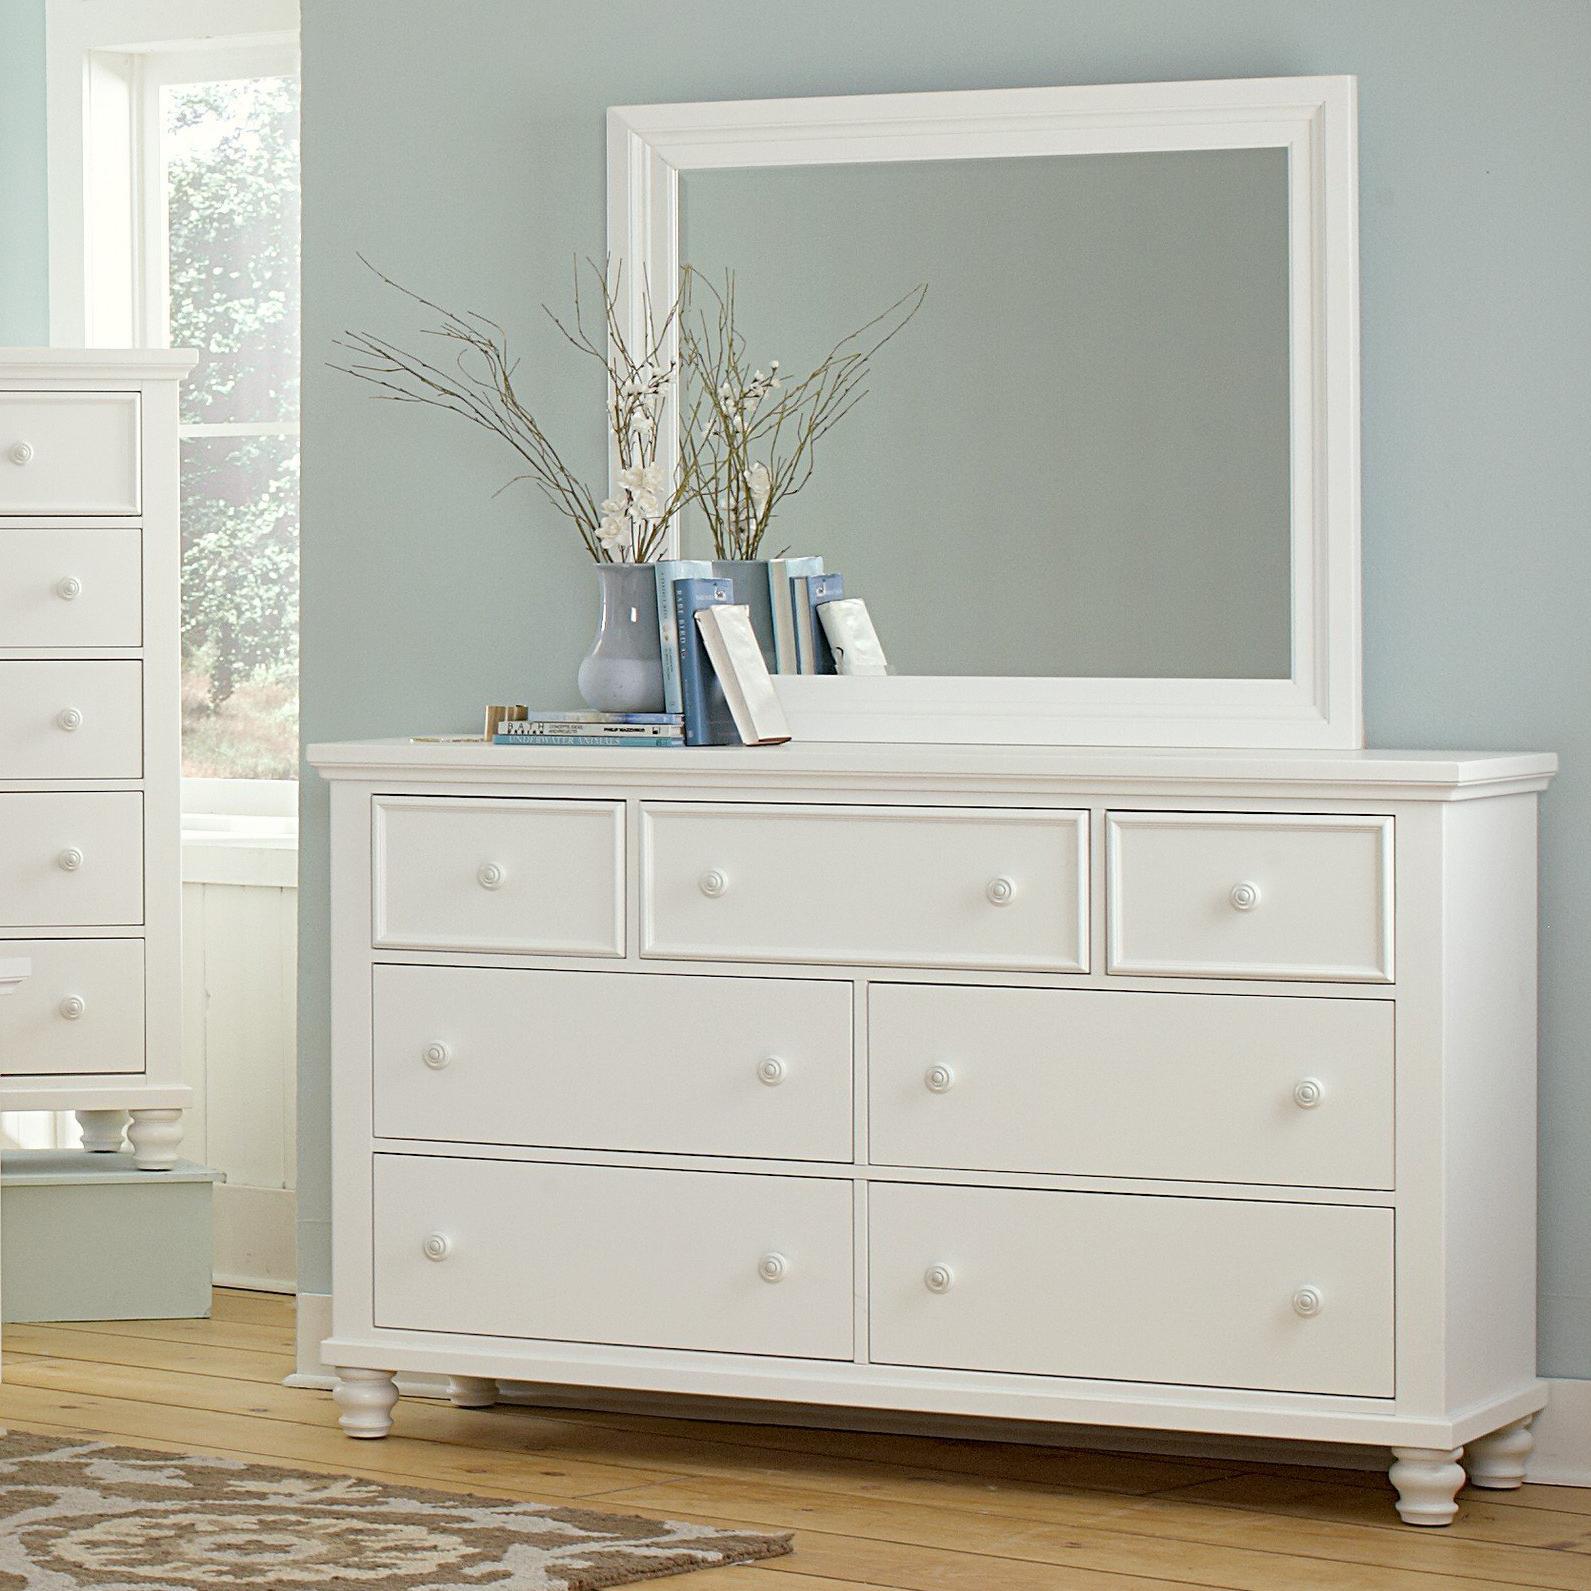 Vaughan Bassett Ellington Triple Dresser & Landscape Mirror - Item Number: 624-002+446